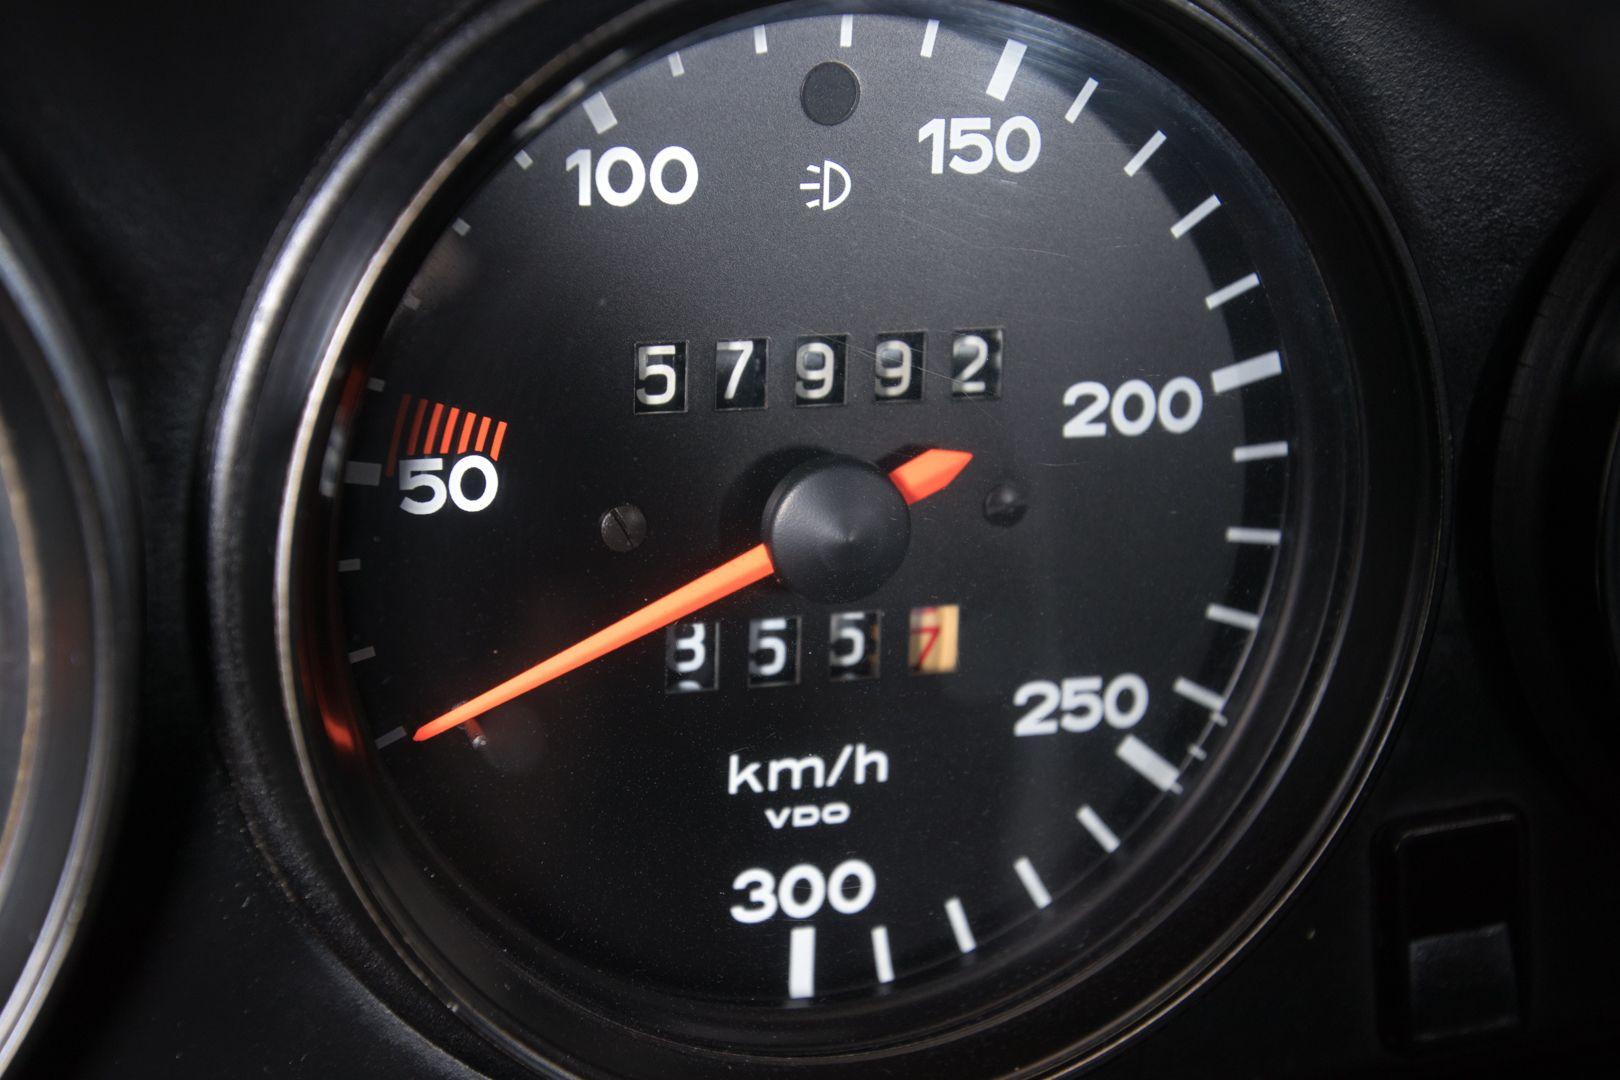 1973 Porsche 911 Carrera 2.7 18279